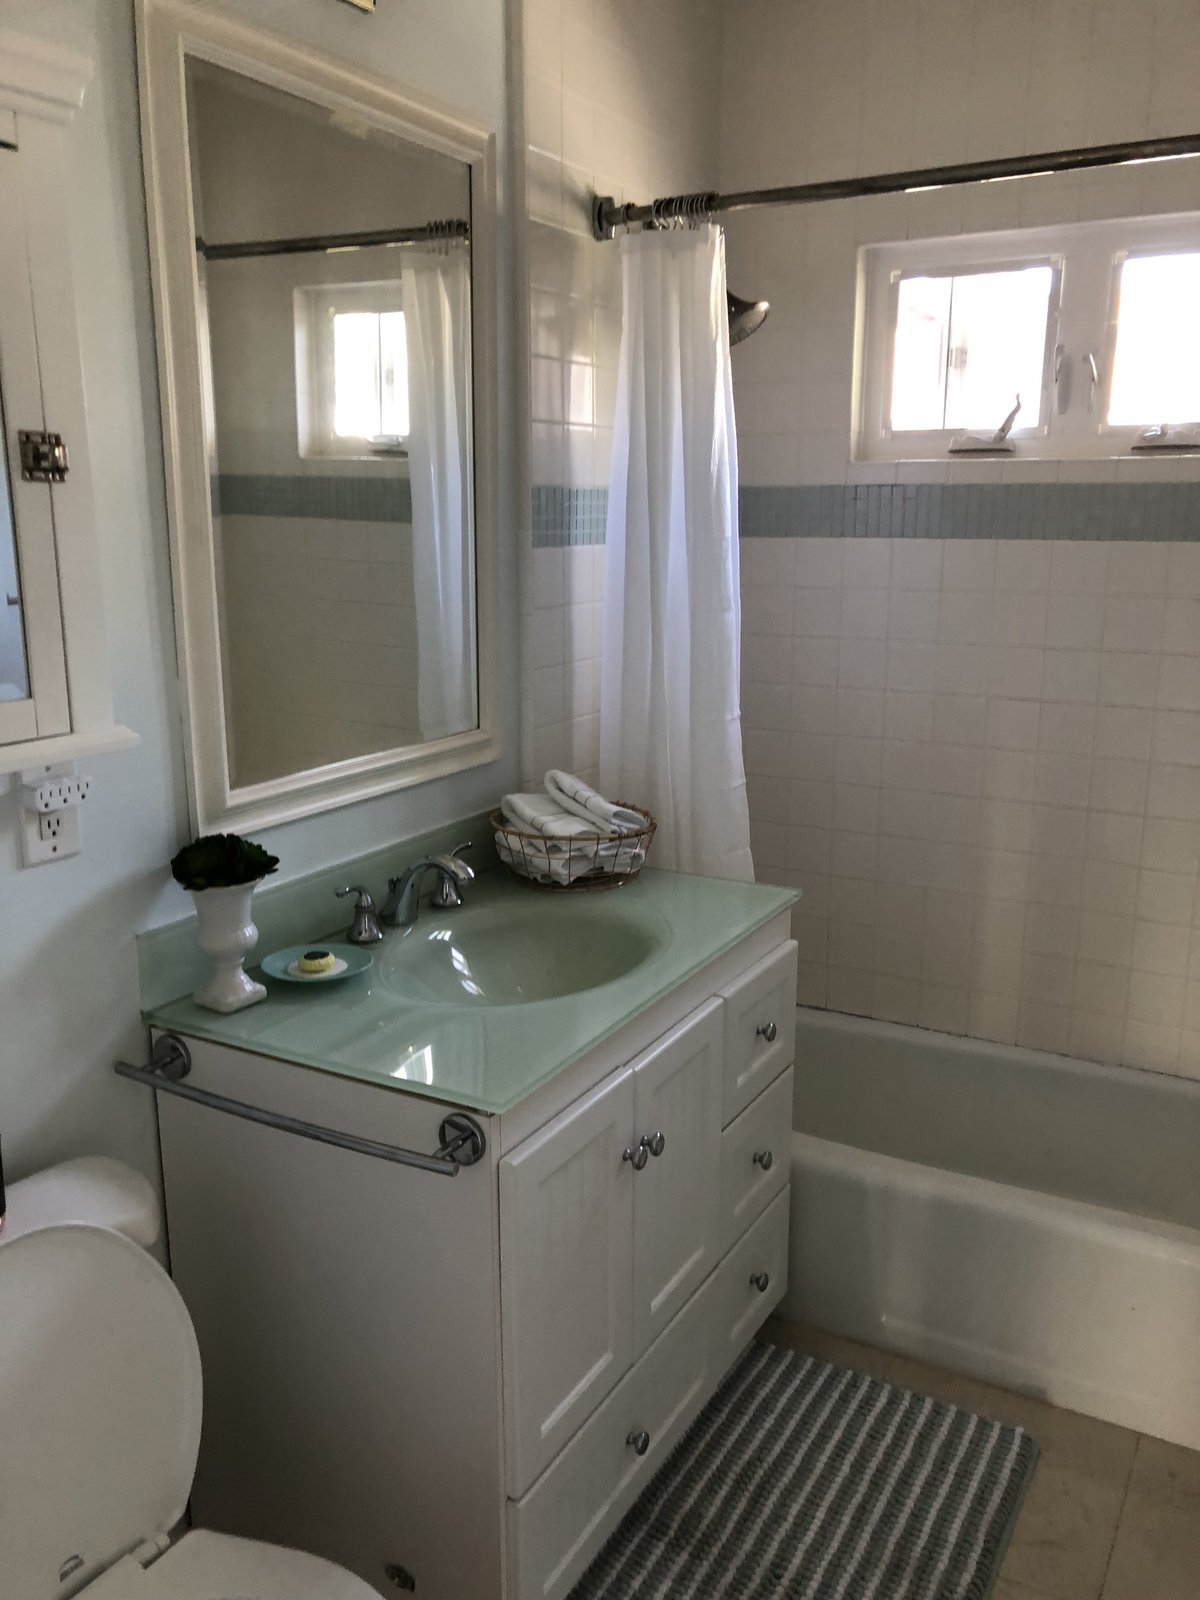 Before: Coeur D'Alene Residence bathroom